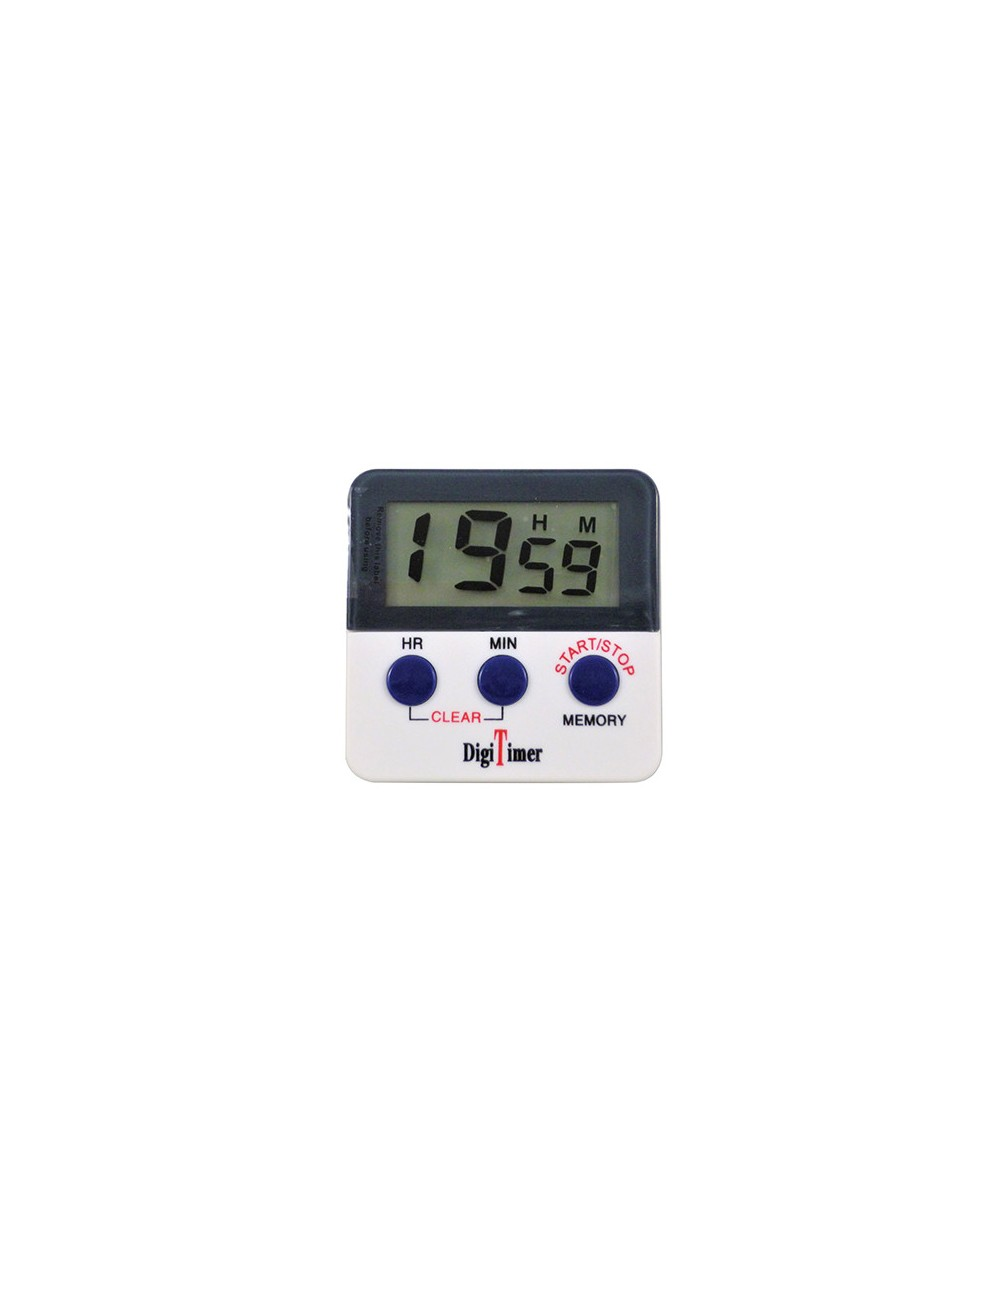 DIGITAL TIMER & STOPWATCH - 19H59M